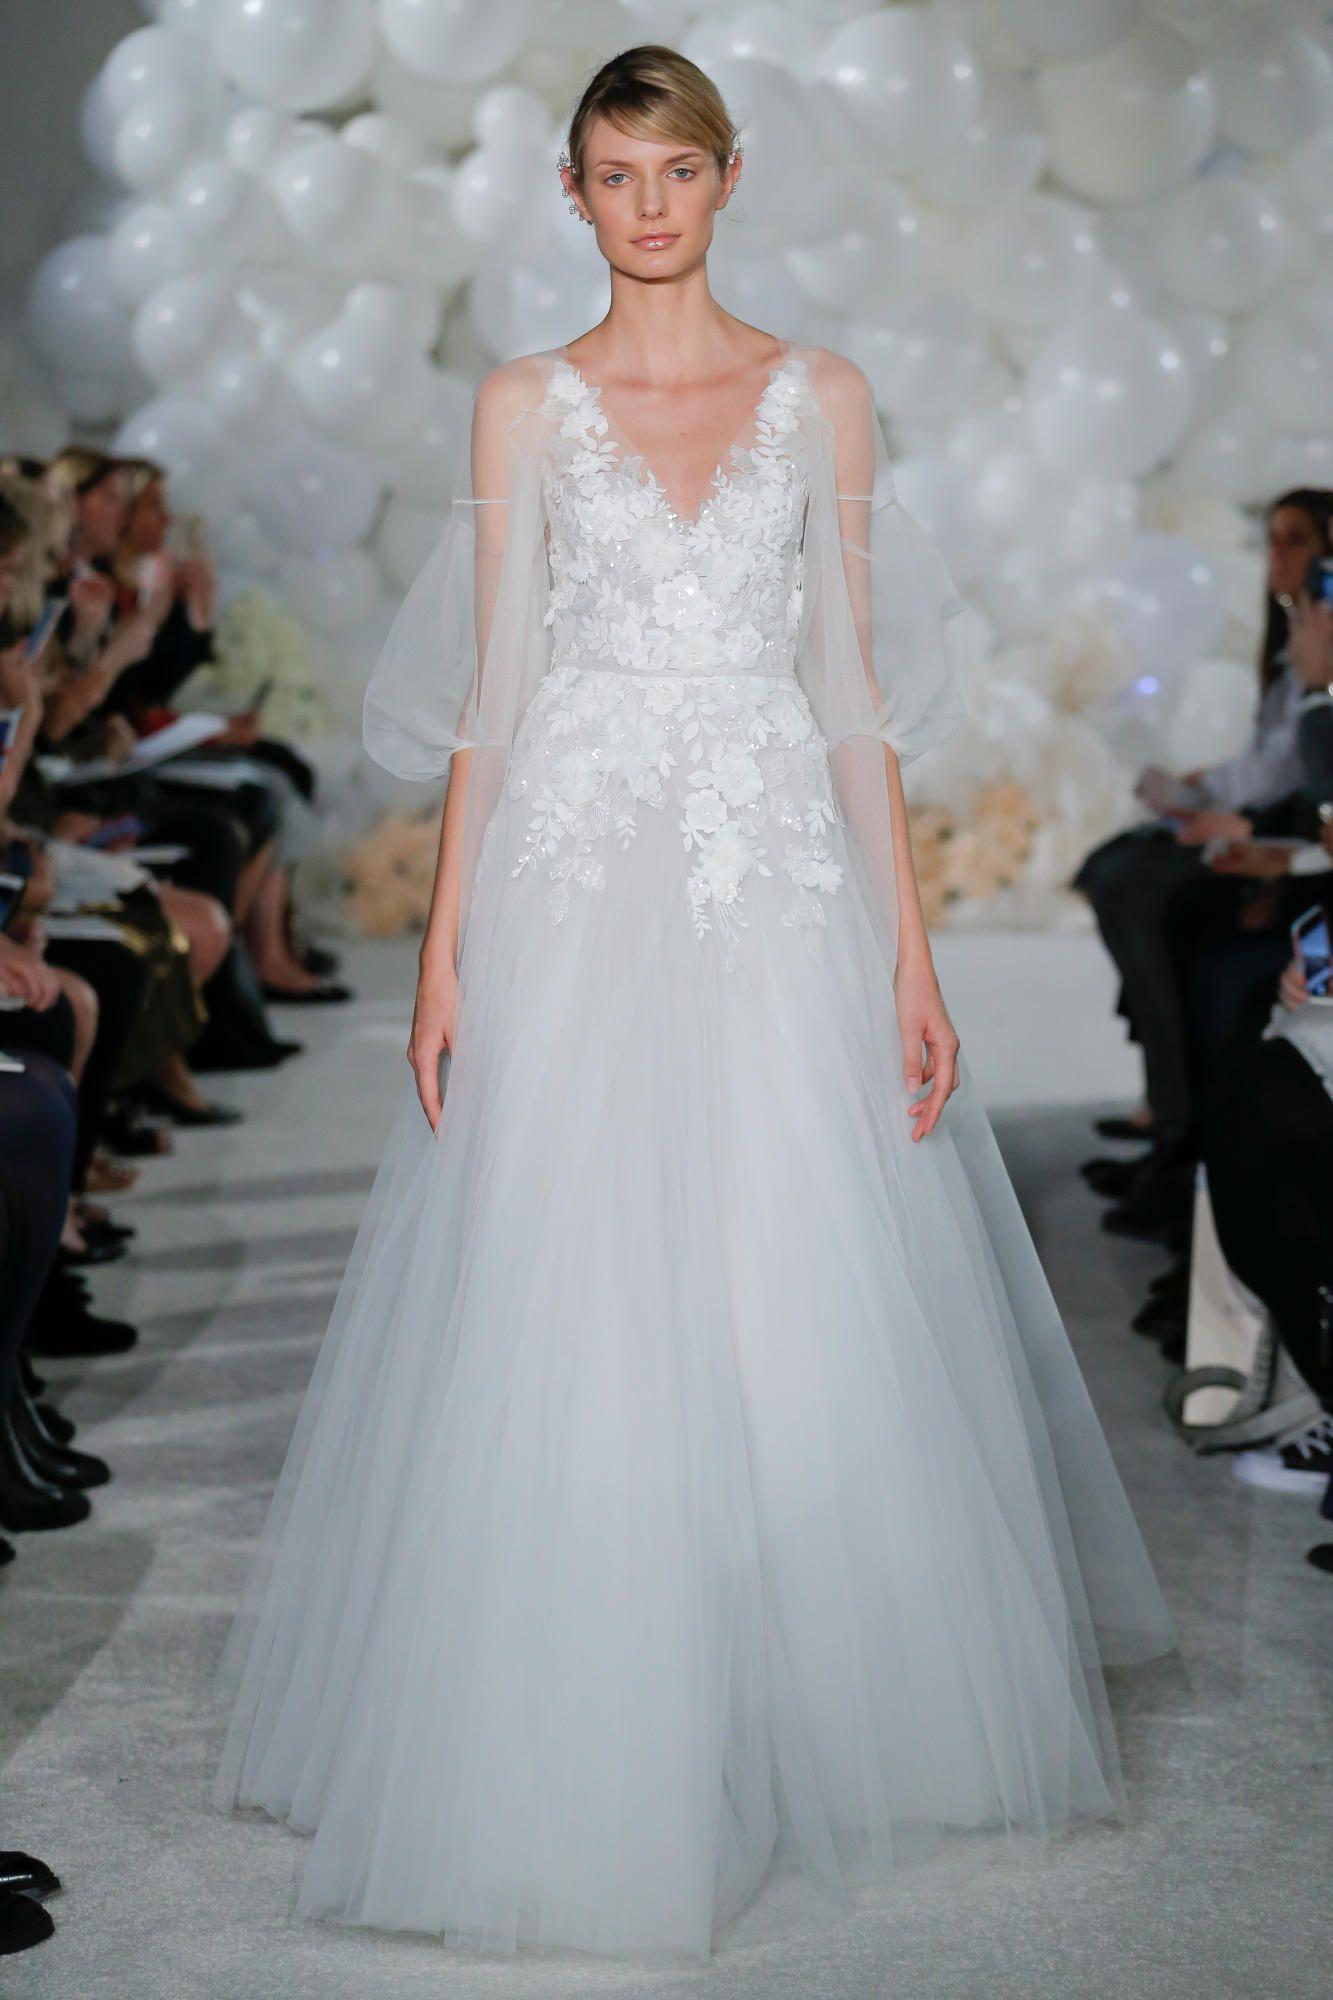 mira-zwillinger-bridal-spring-2018-puff-sleeve-dress Tendências de vestidos de noiva para 2018